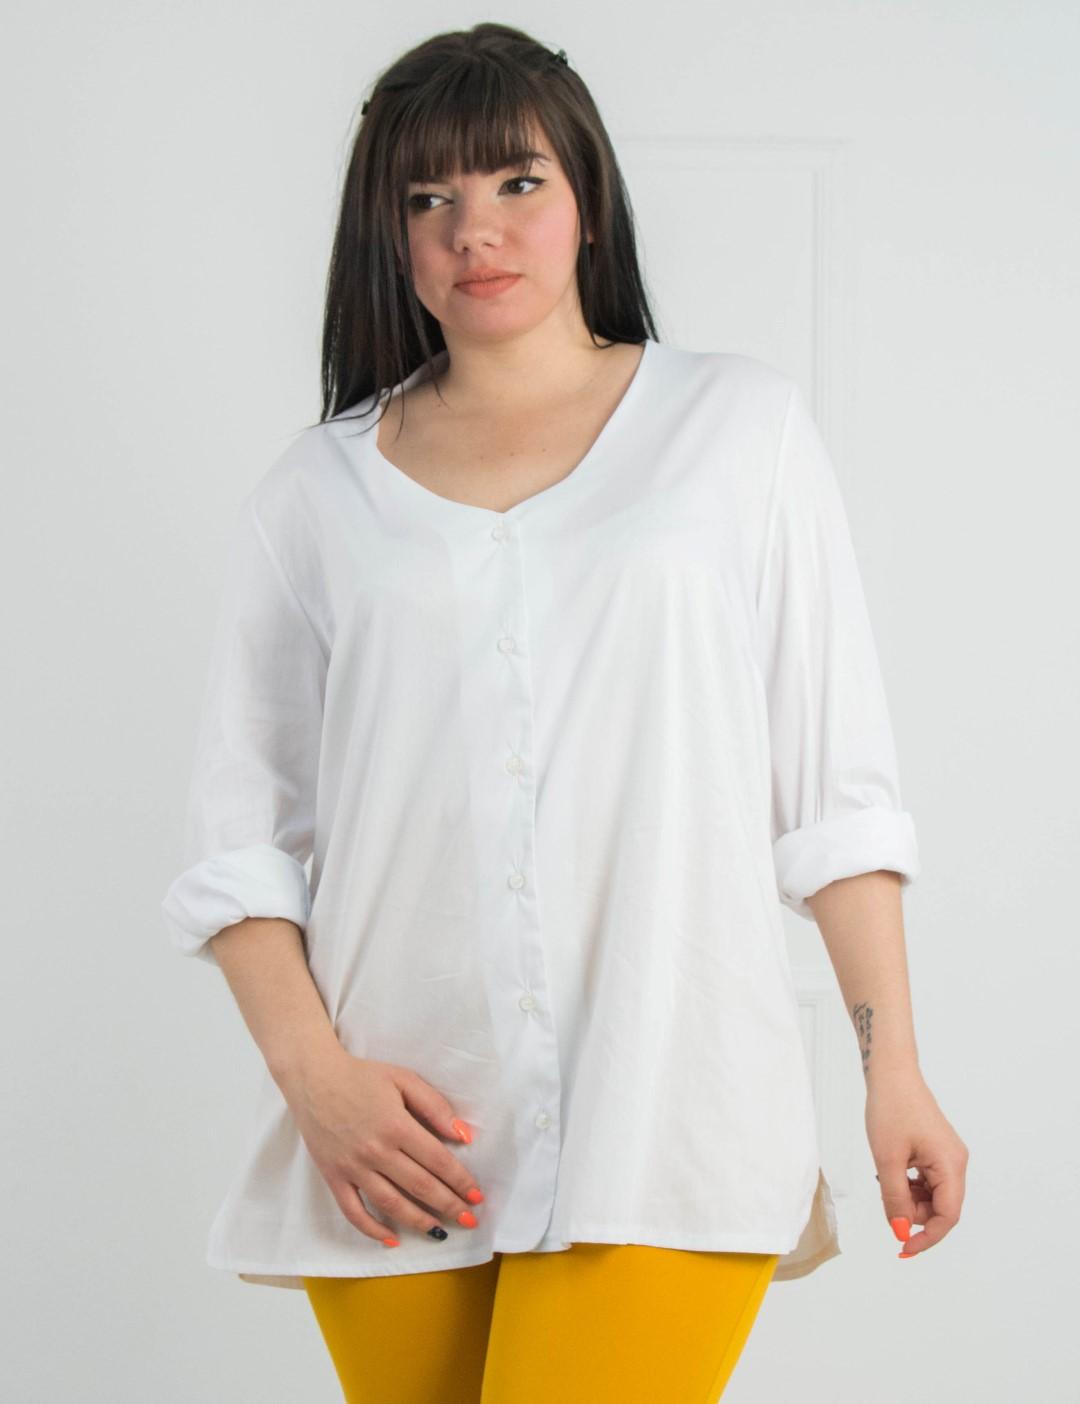 2c2e82825ee2 Γυναικεία λευκή πουκαμίσα μονόχρωμη Plus size 11701908